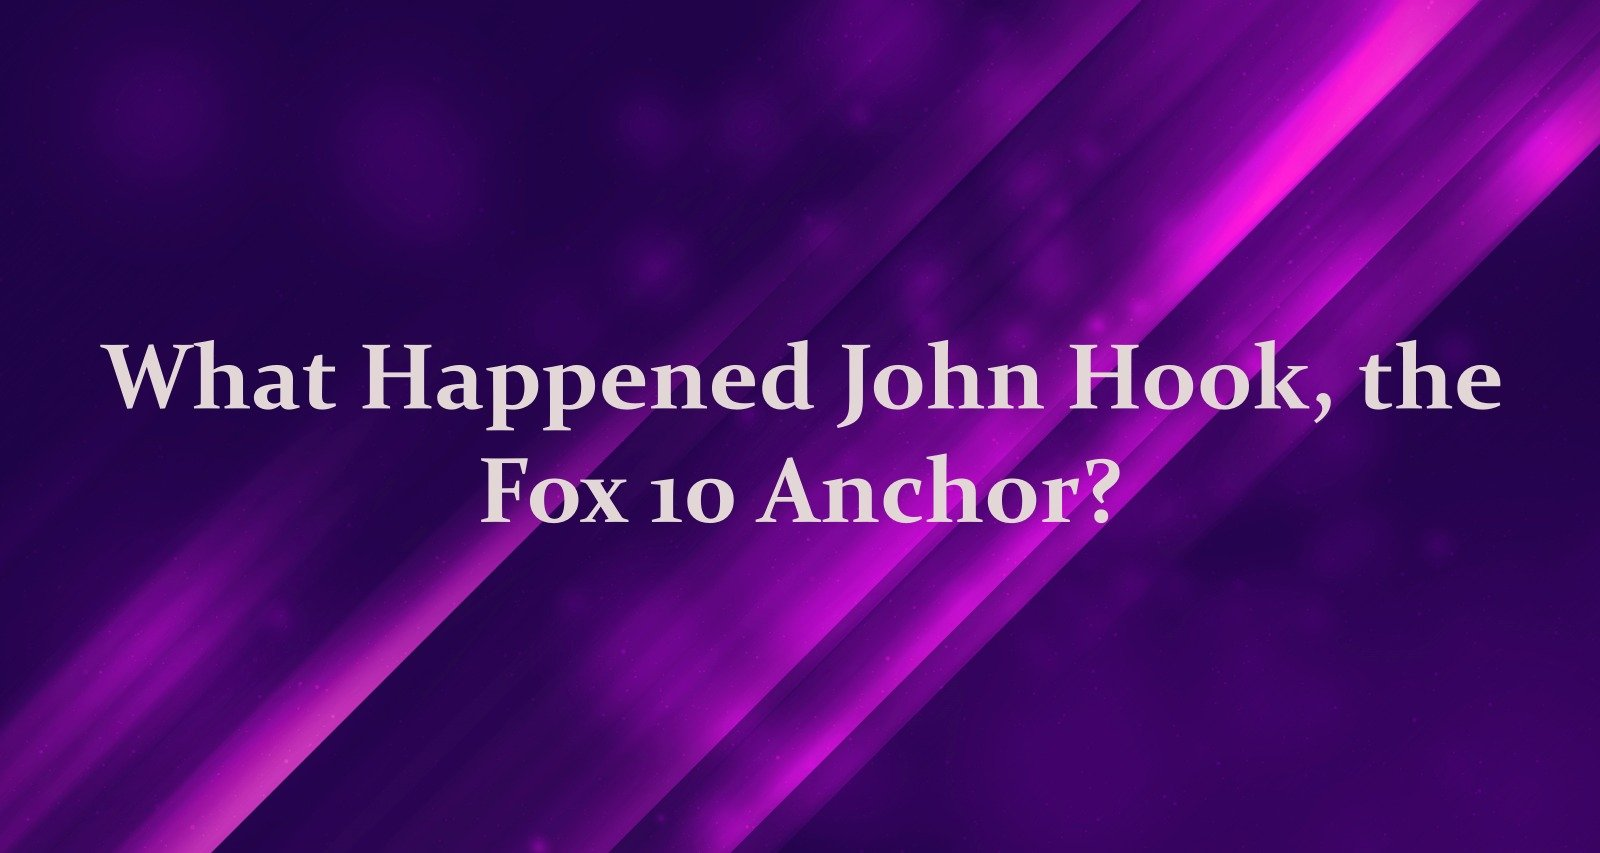 What happened to John Hook